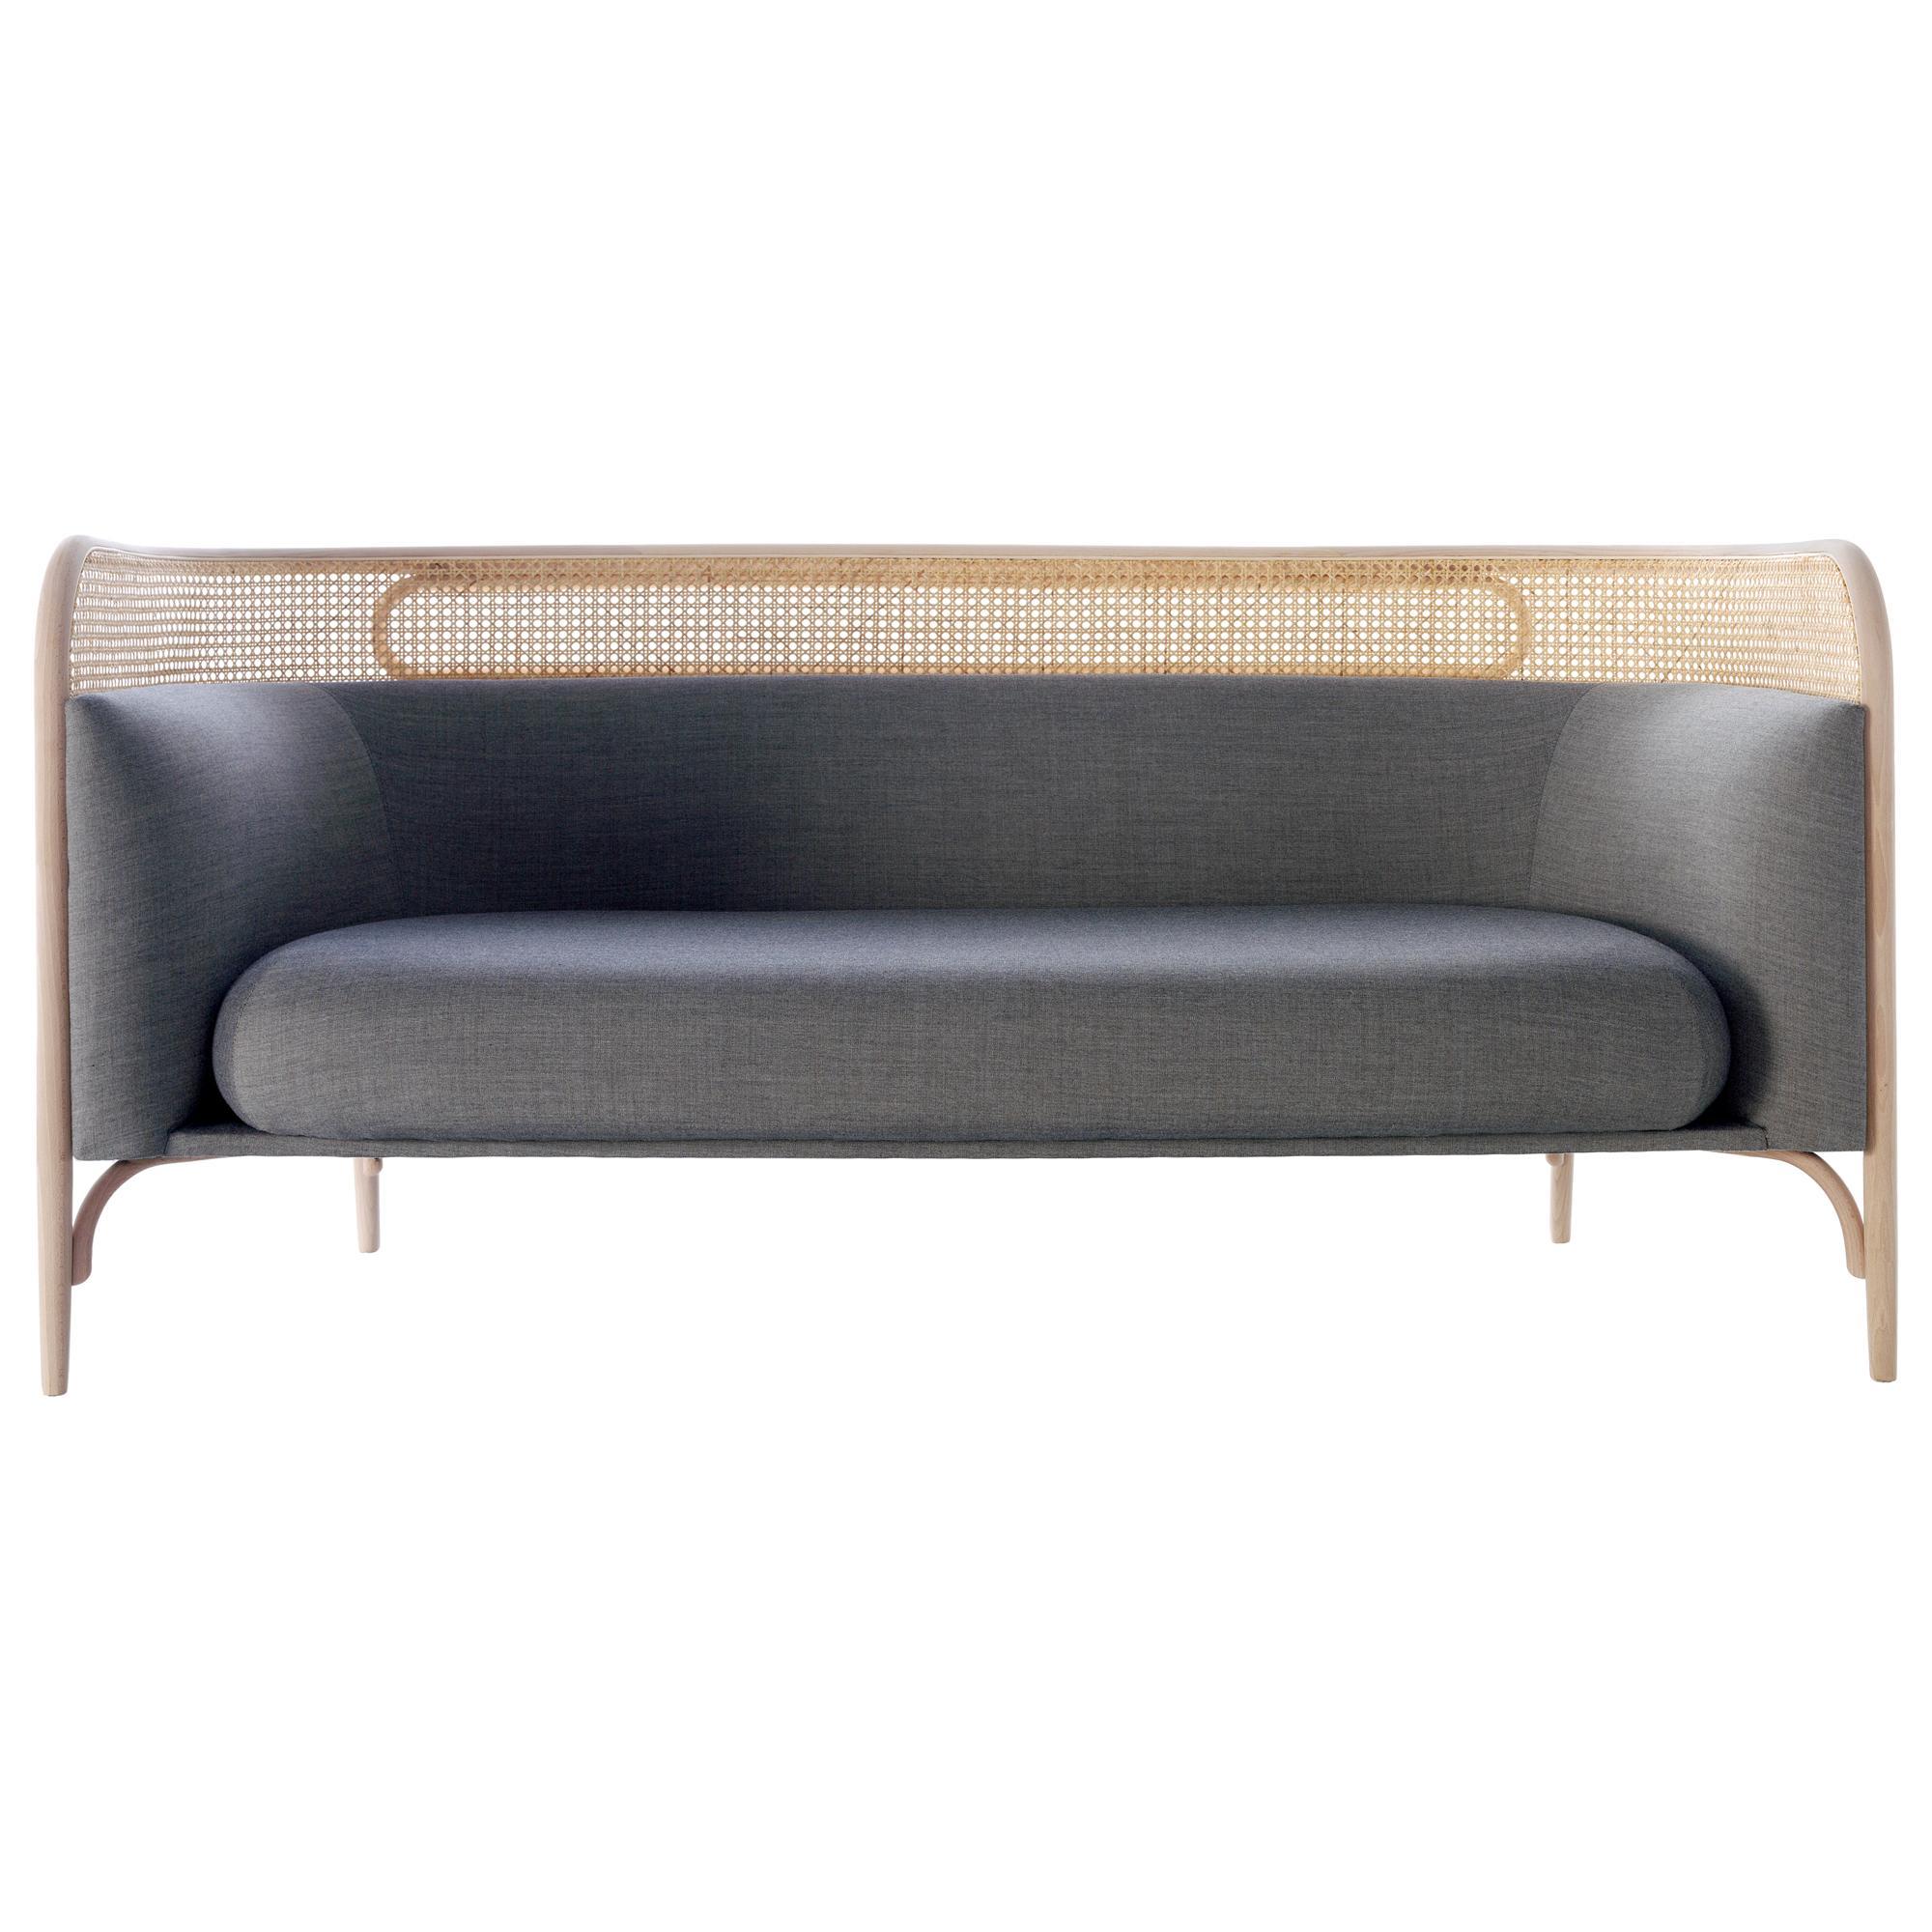 Gebrüder Thonet Vienna GmbH Targa Sofa in Beech with Upholstery by Gamfratesi